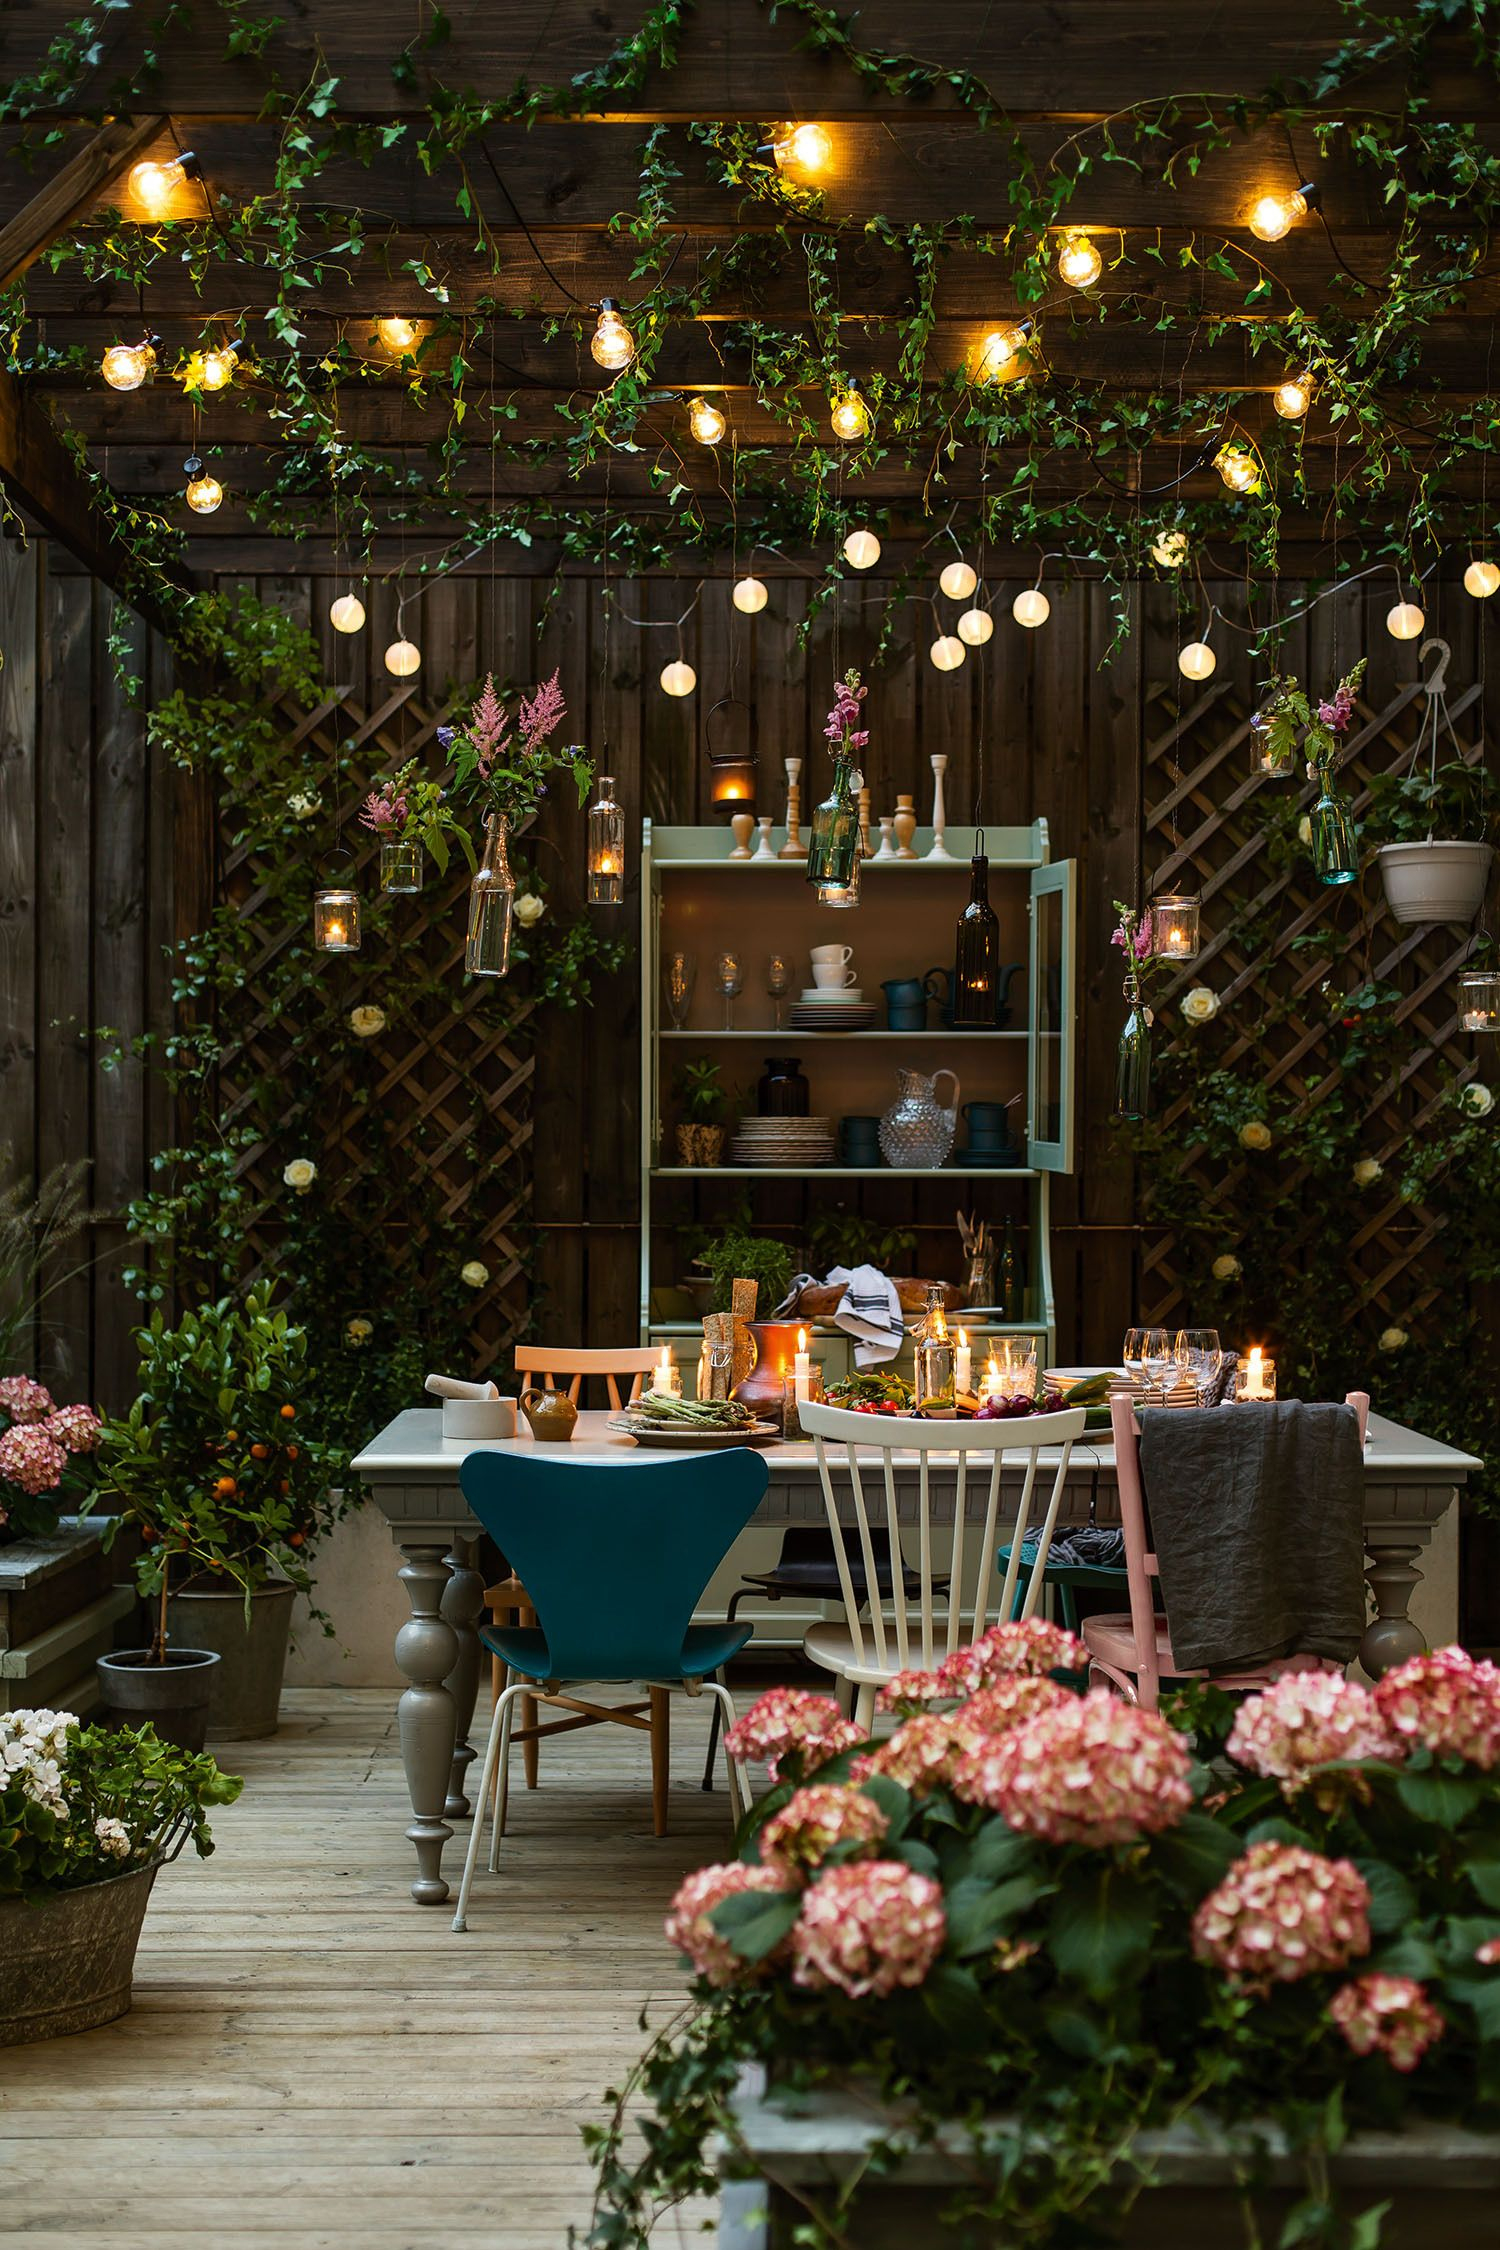 Outdoor / Terrasse / Jardin D'été / Jardin D'hiver | Ev ... tout Terrase De Jardin